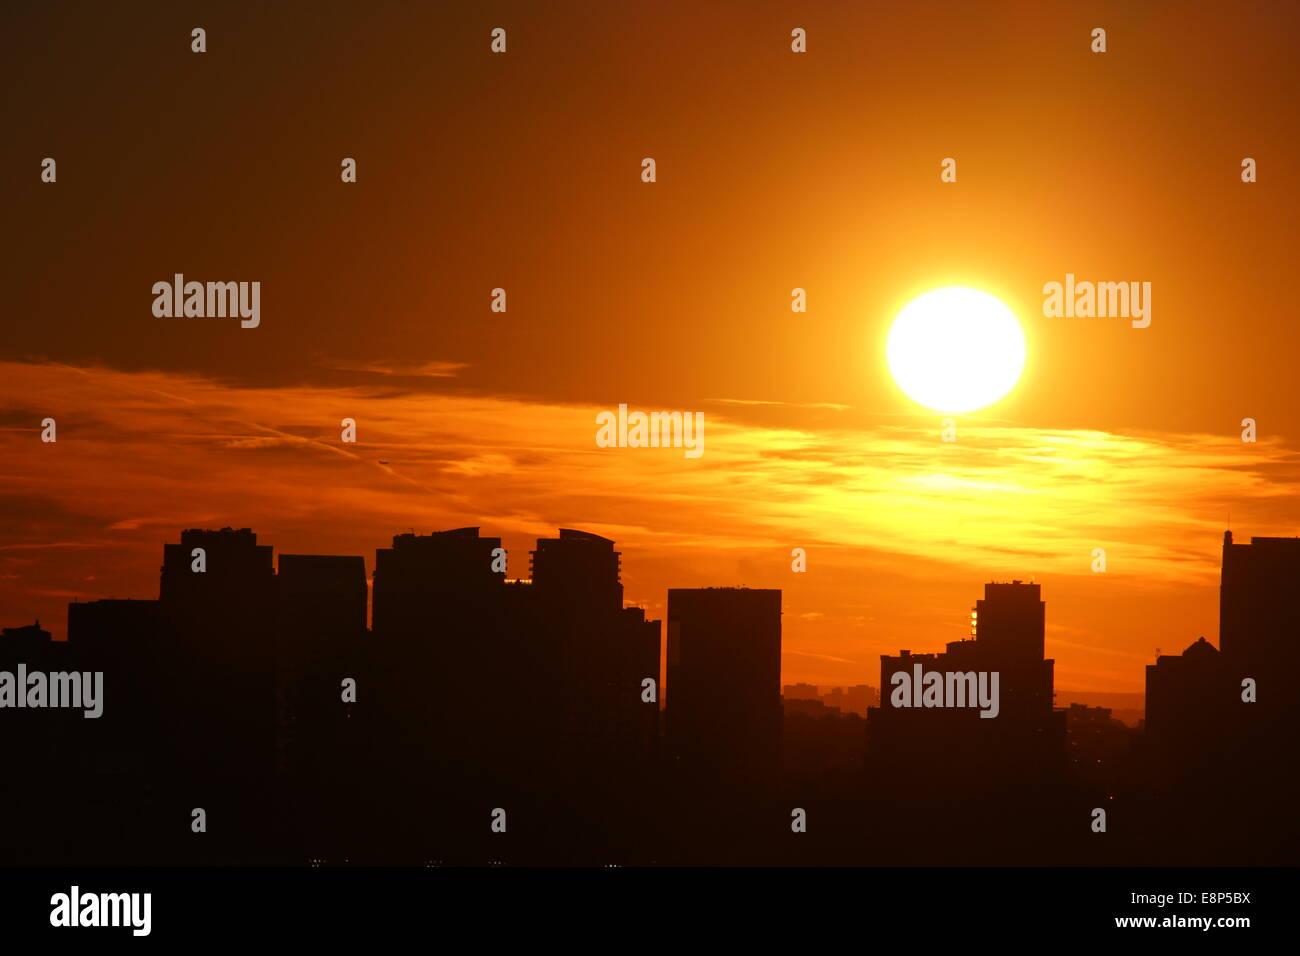 Urban_Sunset-E8P5BX.jpg